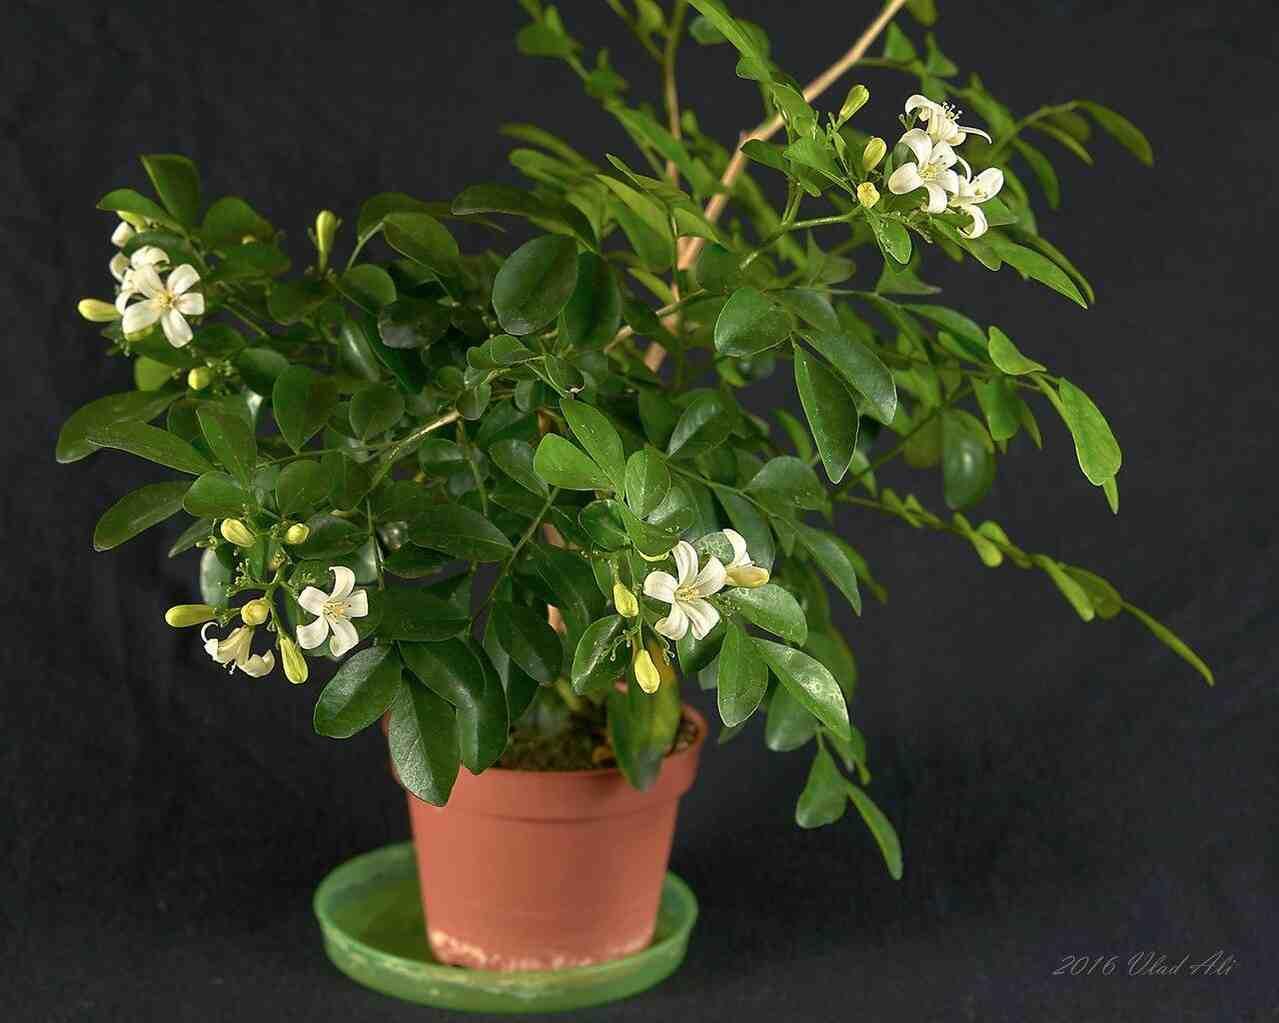 Цветок мурайя: фото, уход в домашних условиях, лечебные свойства